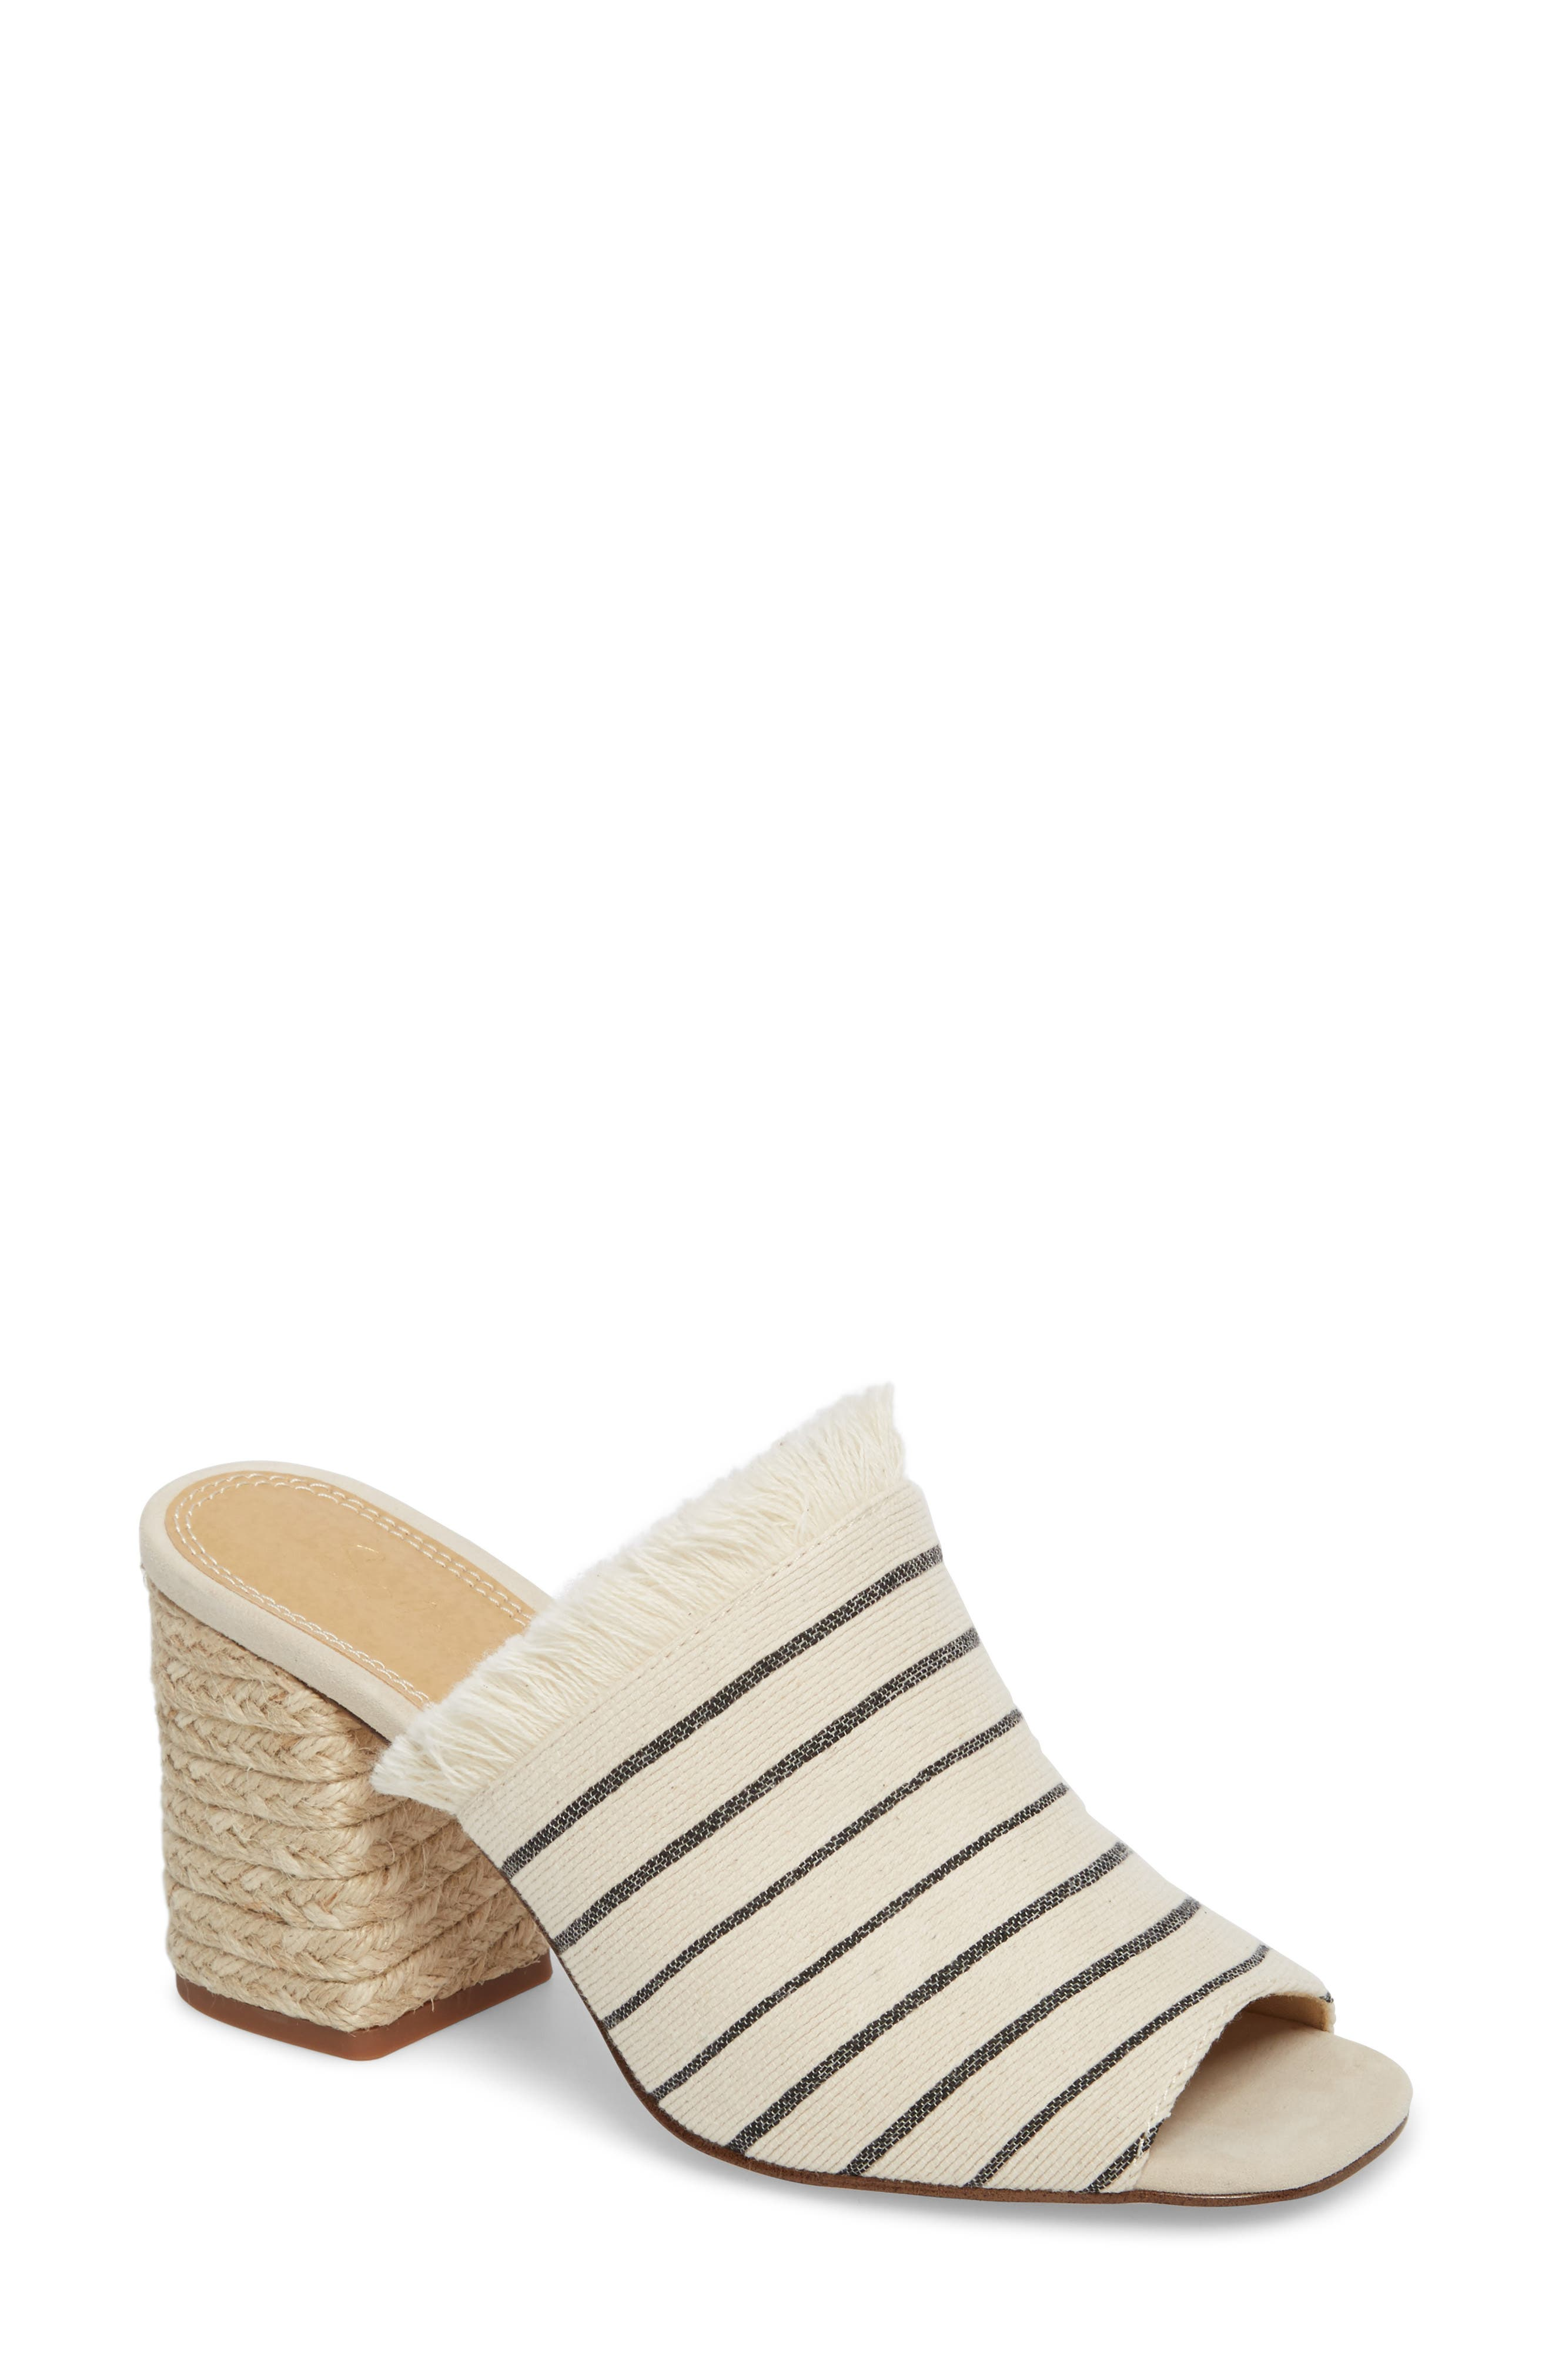 Baron Fringed Block Heel Slide,                         Main,                         color,